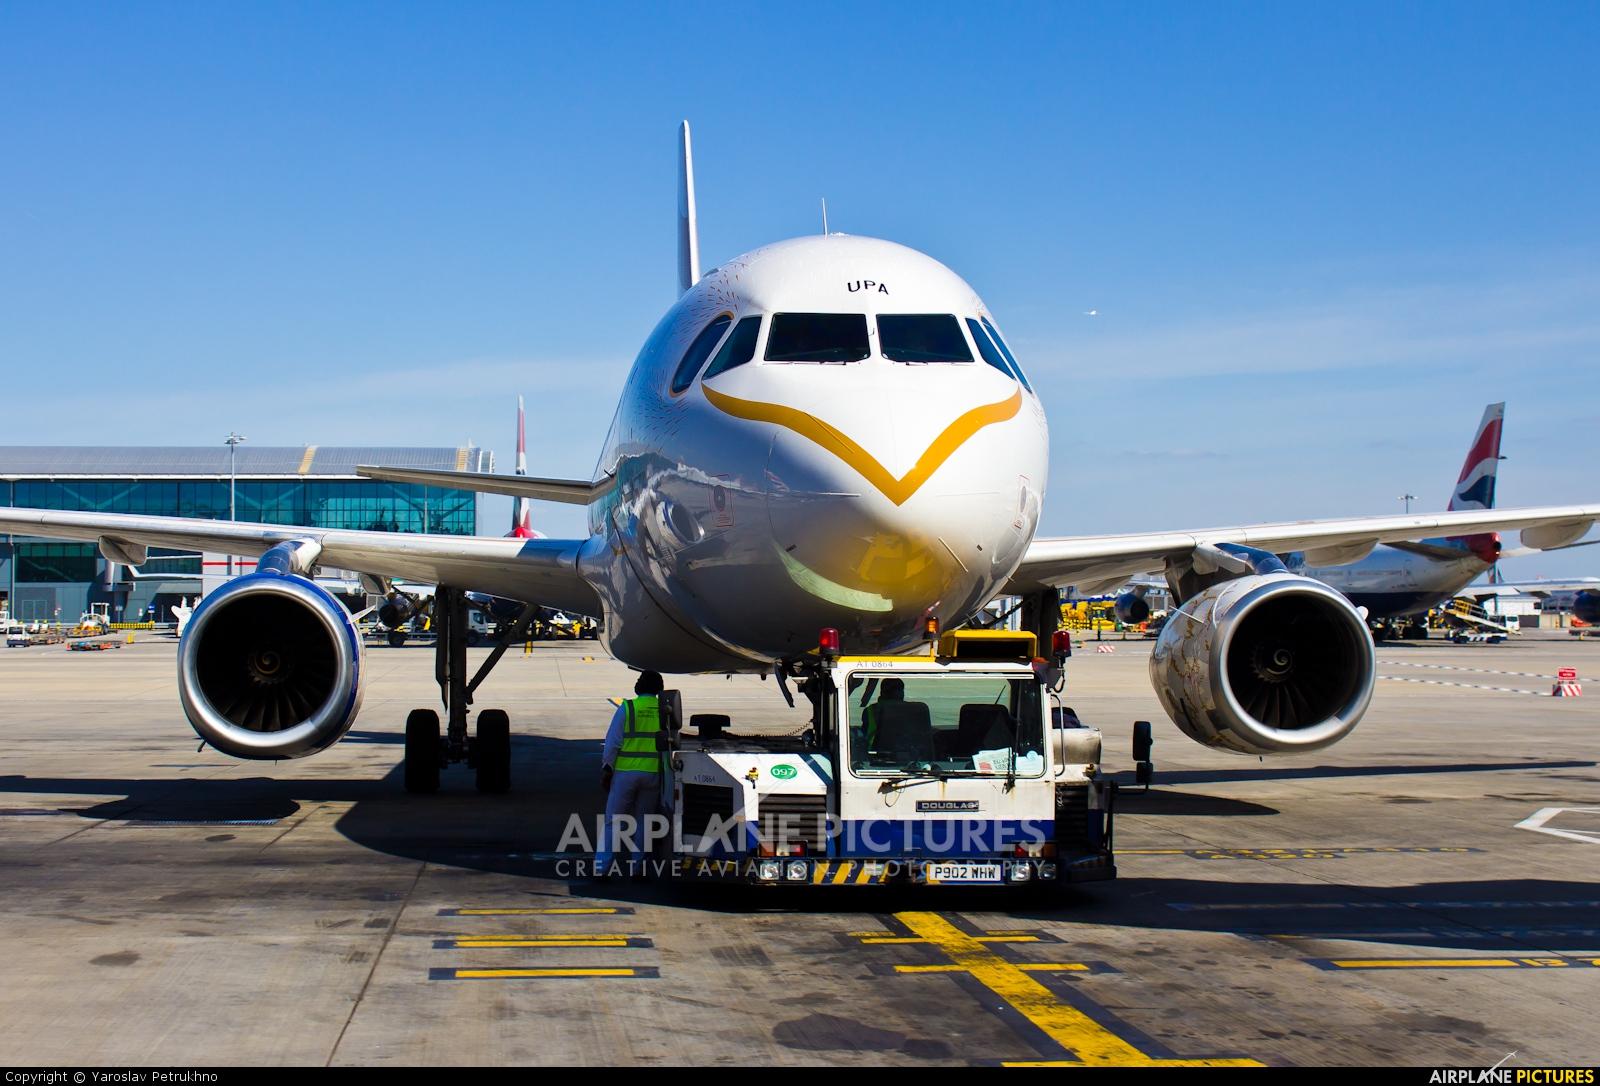 British Airways G-EUPA aircraft at London - Heathrow